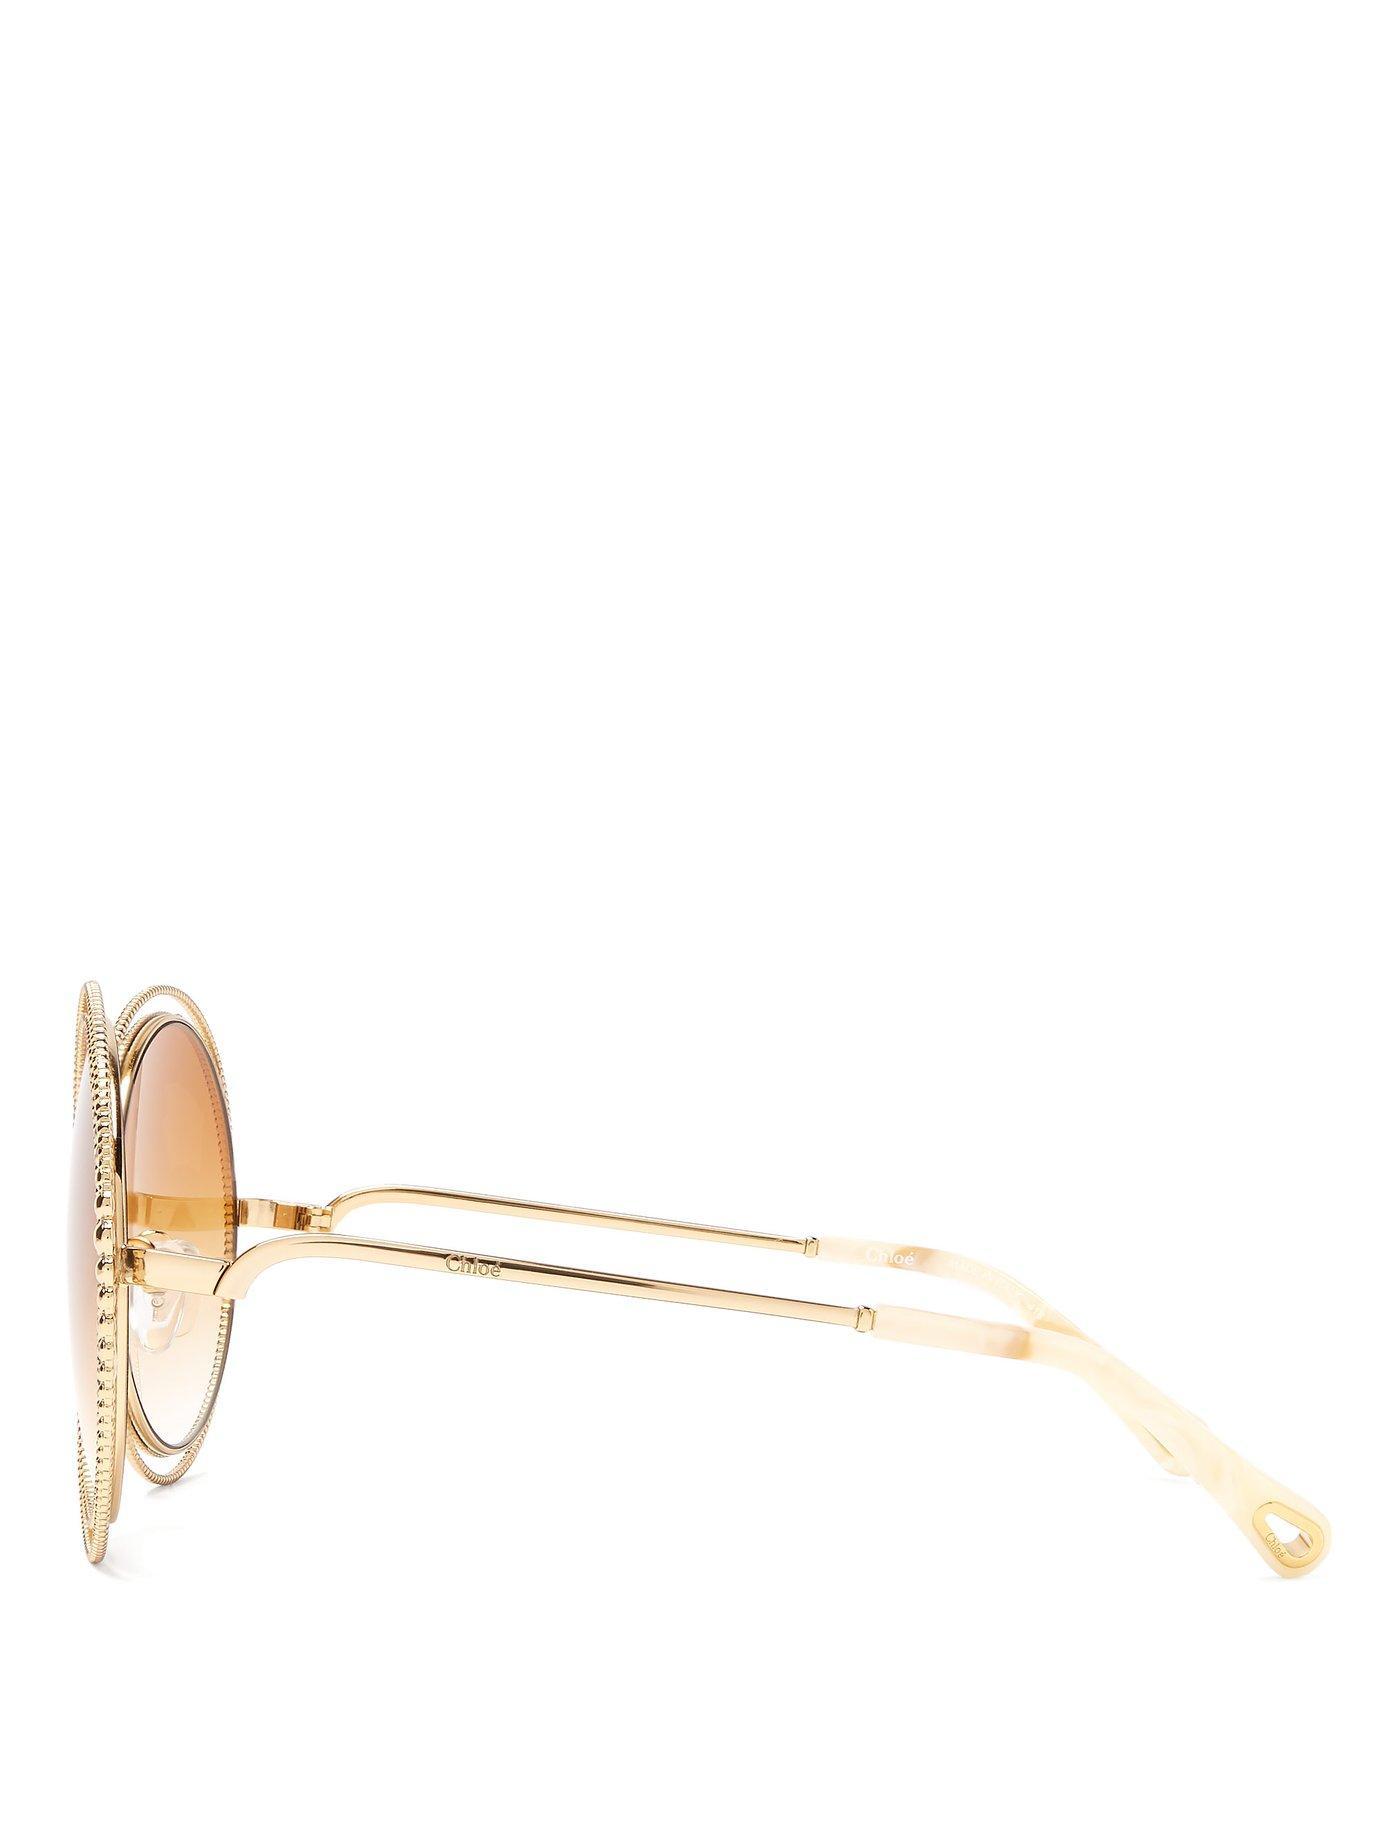 29f41a97818 ... Carlina Chain Frame Oversized Round Sunglasses - Lyst. View fullscreen